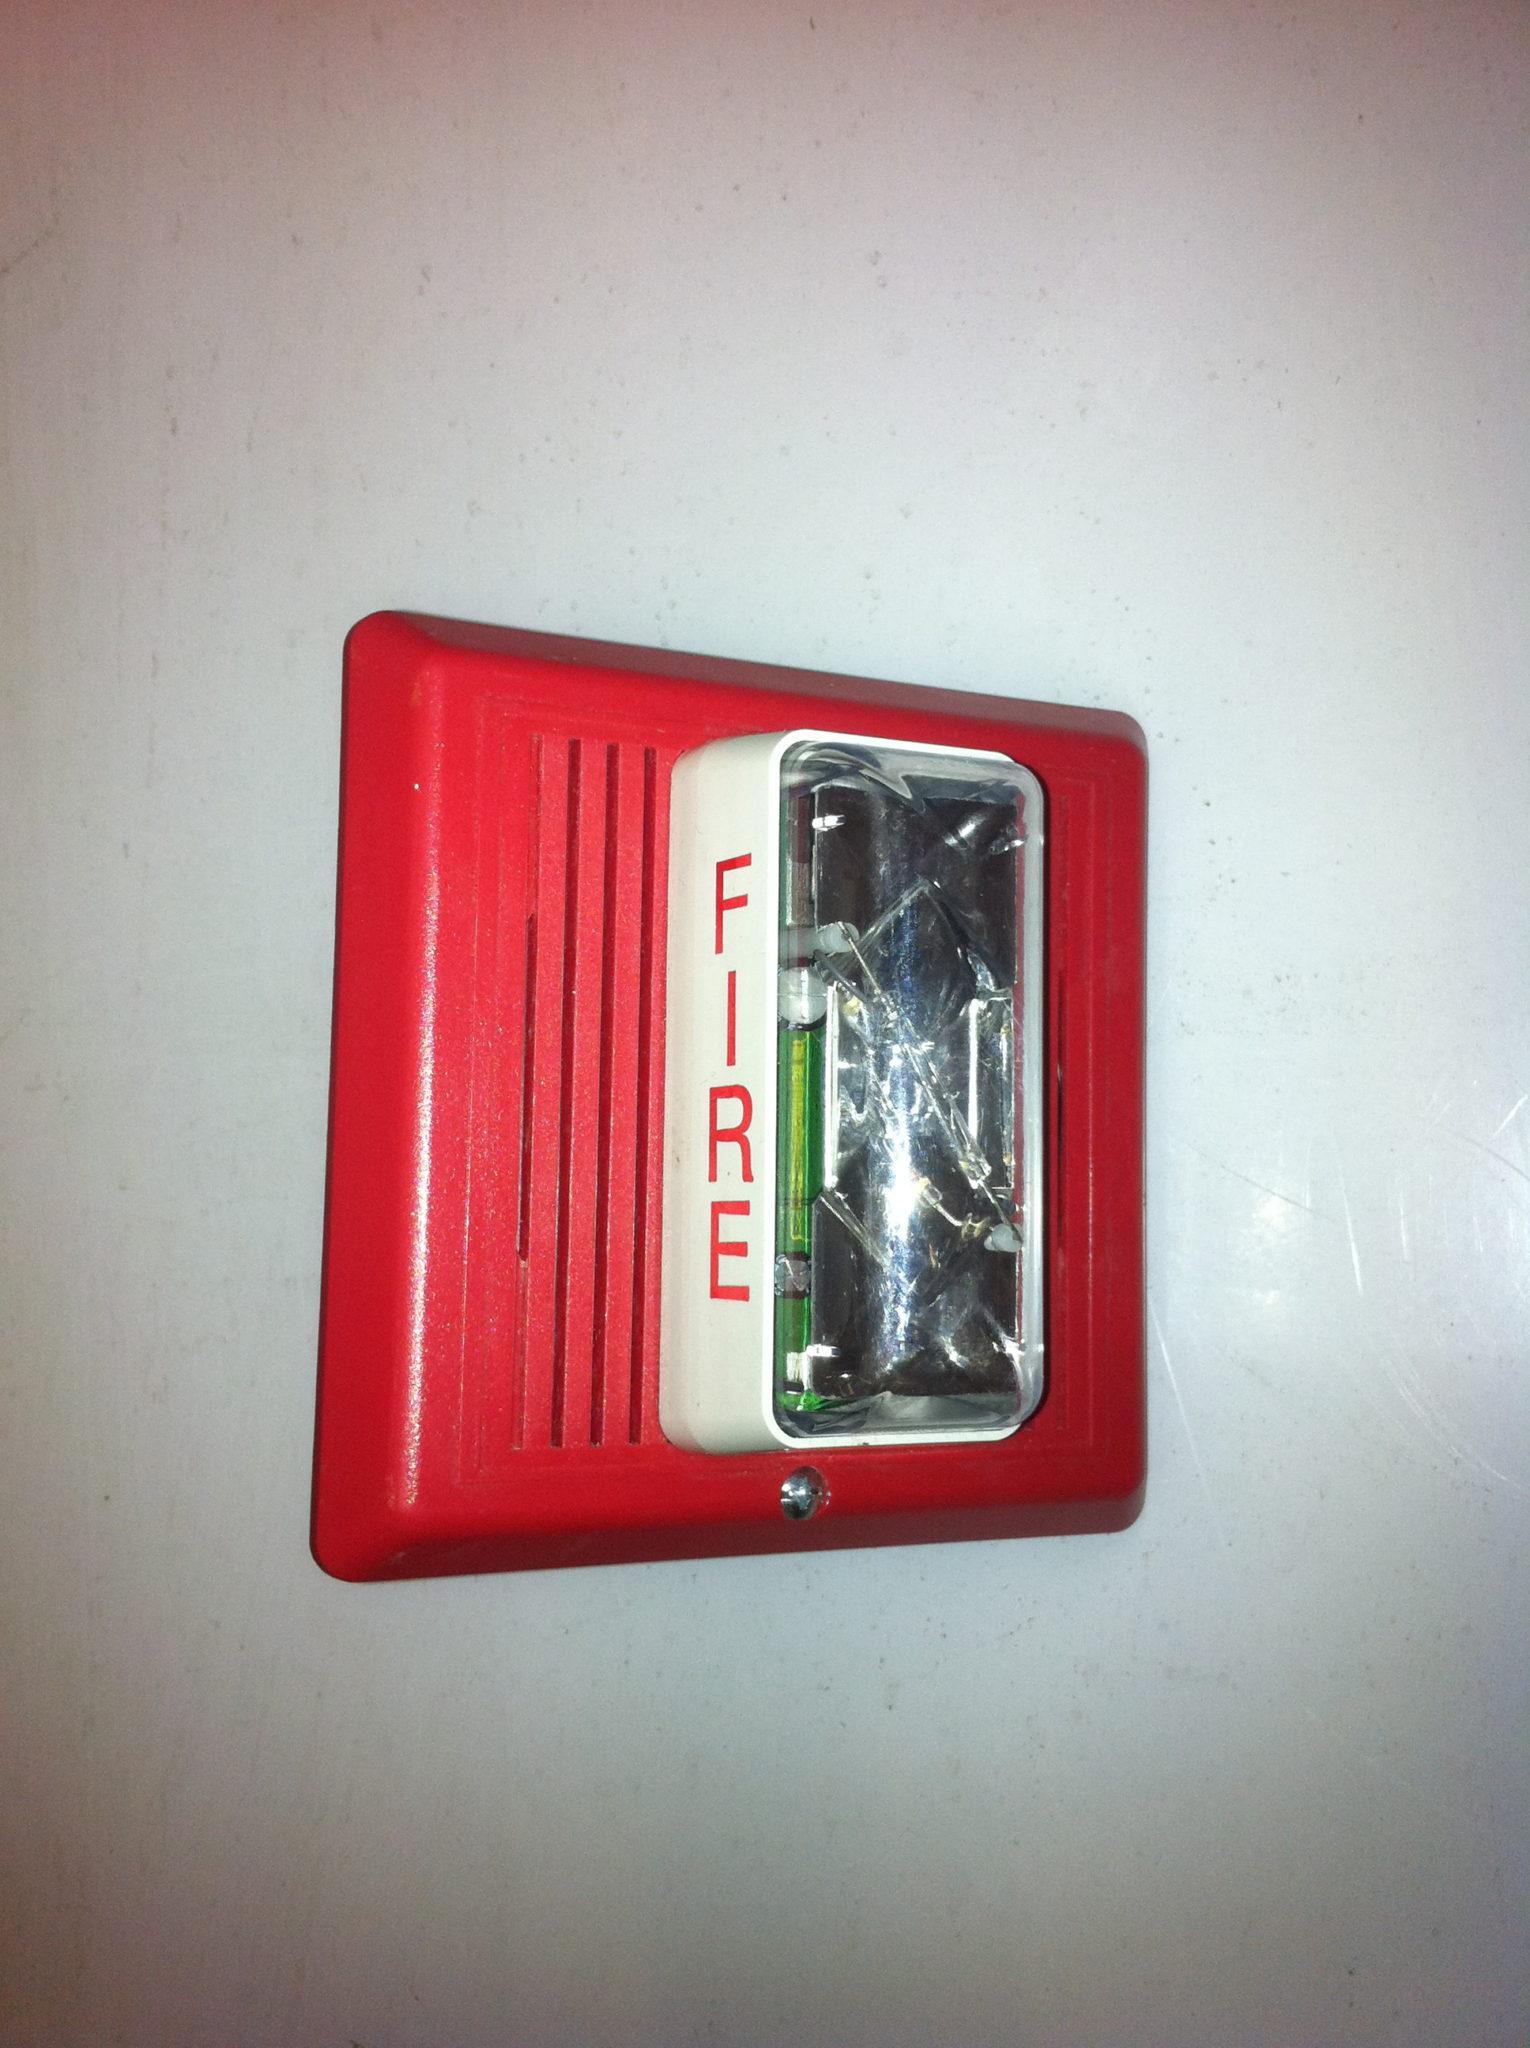 Fire Alarm - Modern Mounted